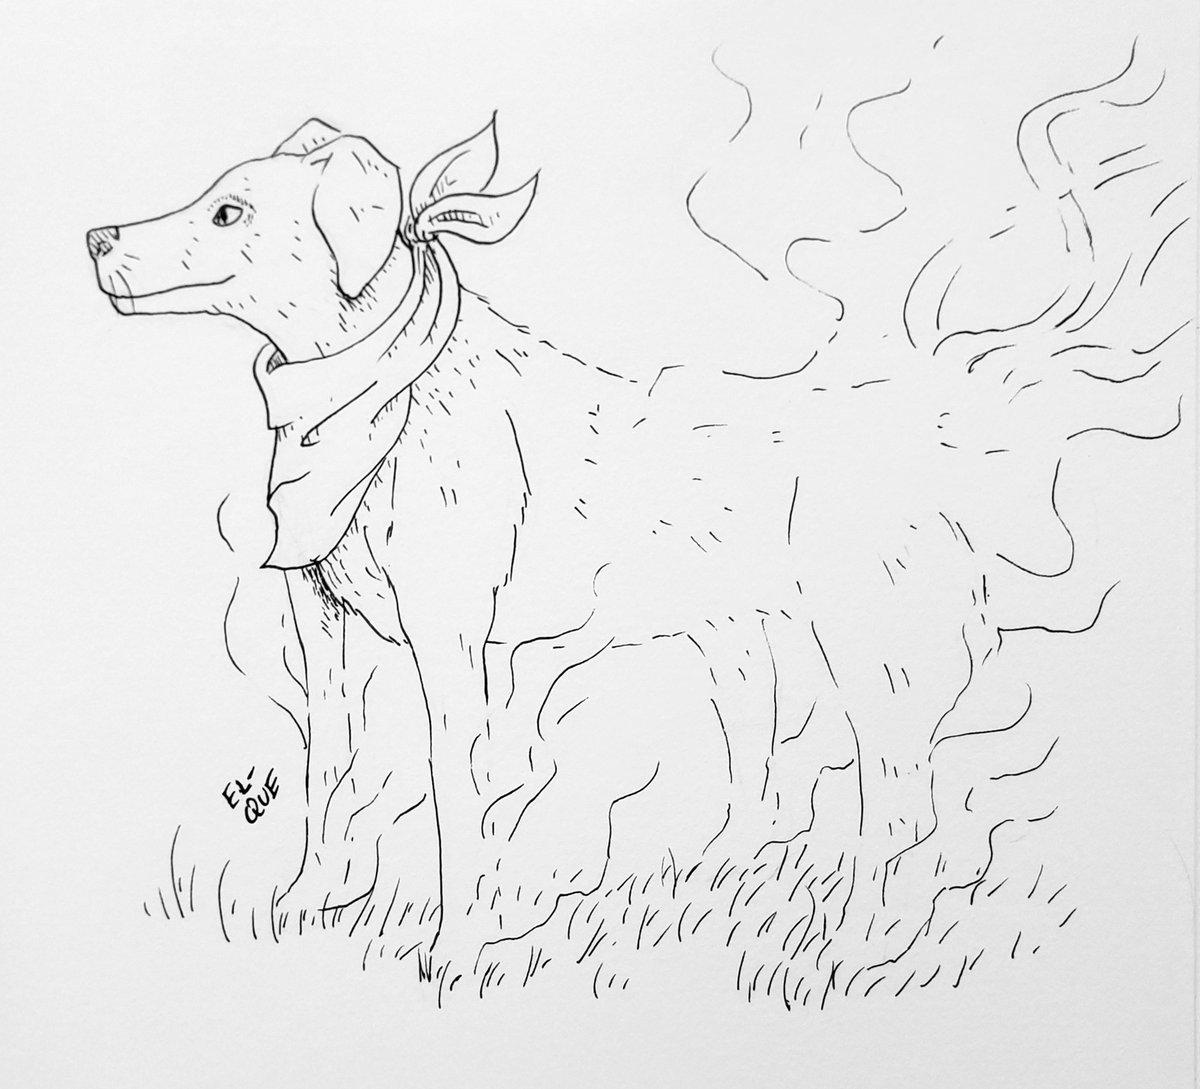 My boy passed on late 2020, may his sprit roam the wilds 💚 To my boy Oscar - #el_que #illustration #art #artwork #drawlloween #day21 #challenge #artchallenge #ink #inkwork #linework #dog #boy #myboy #goodestboy #ridgeback #departed #inmemoryof #spirit #animalspirit #blackdog